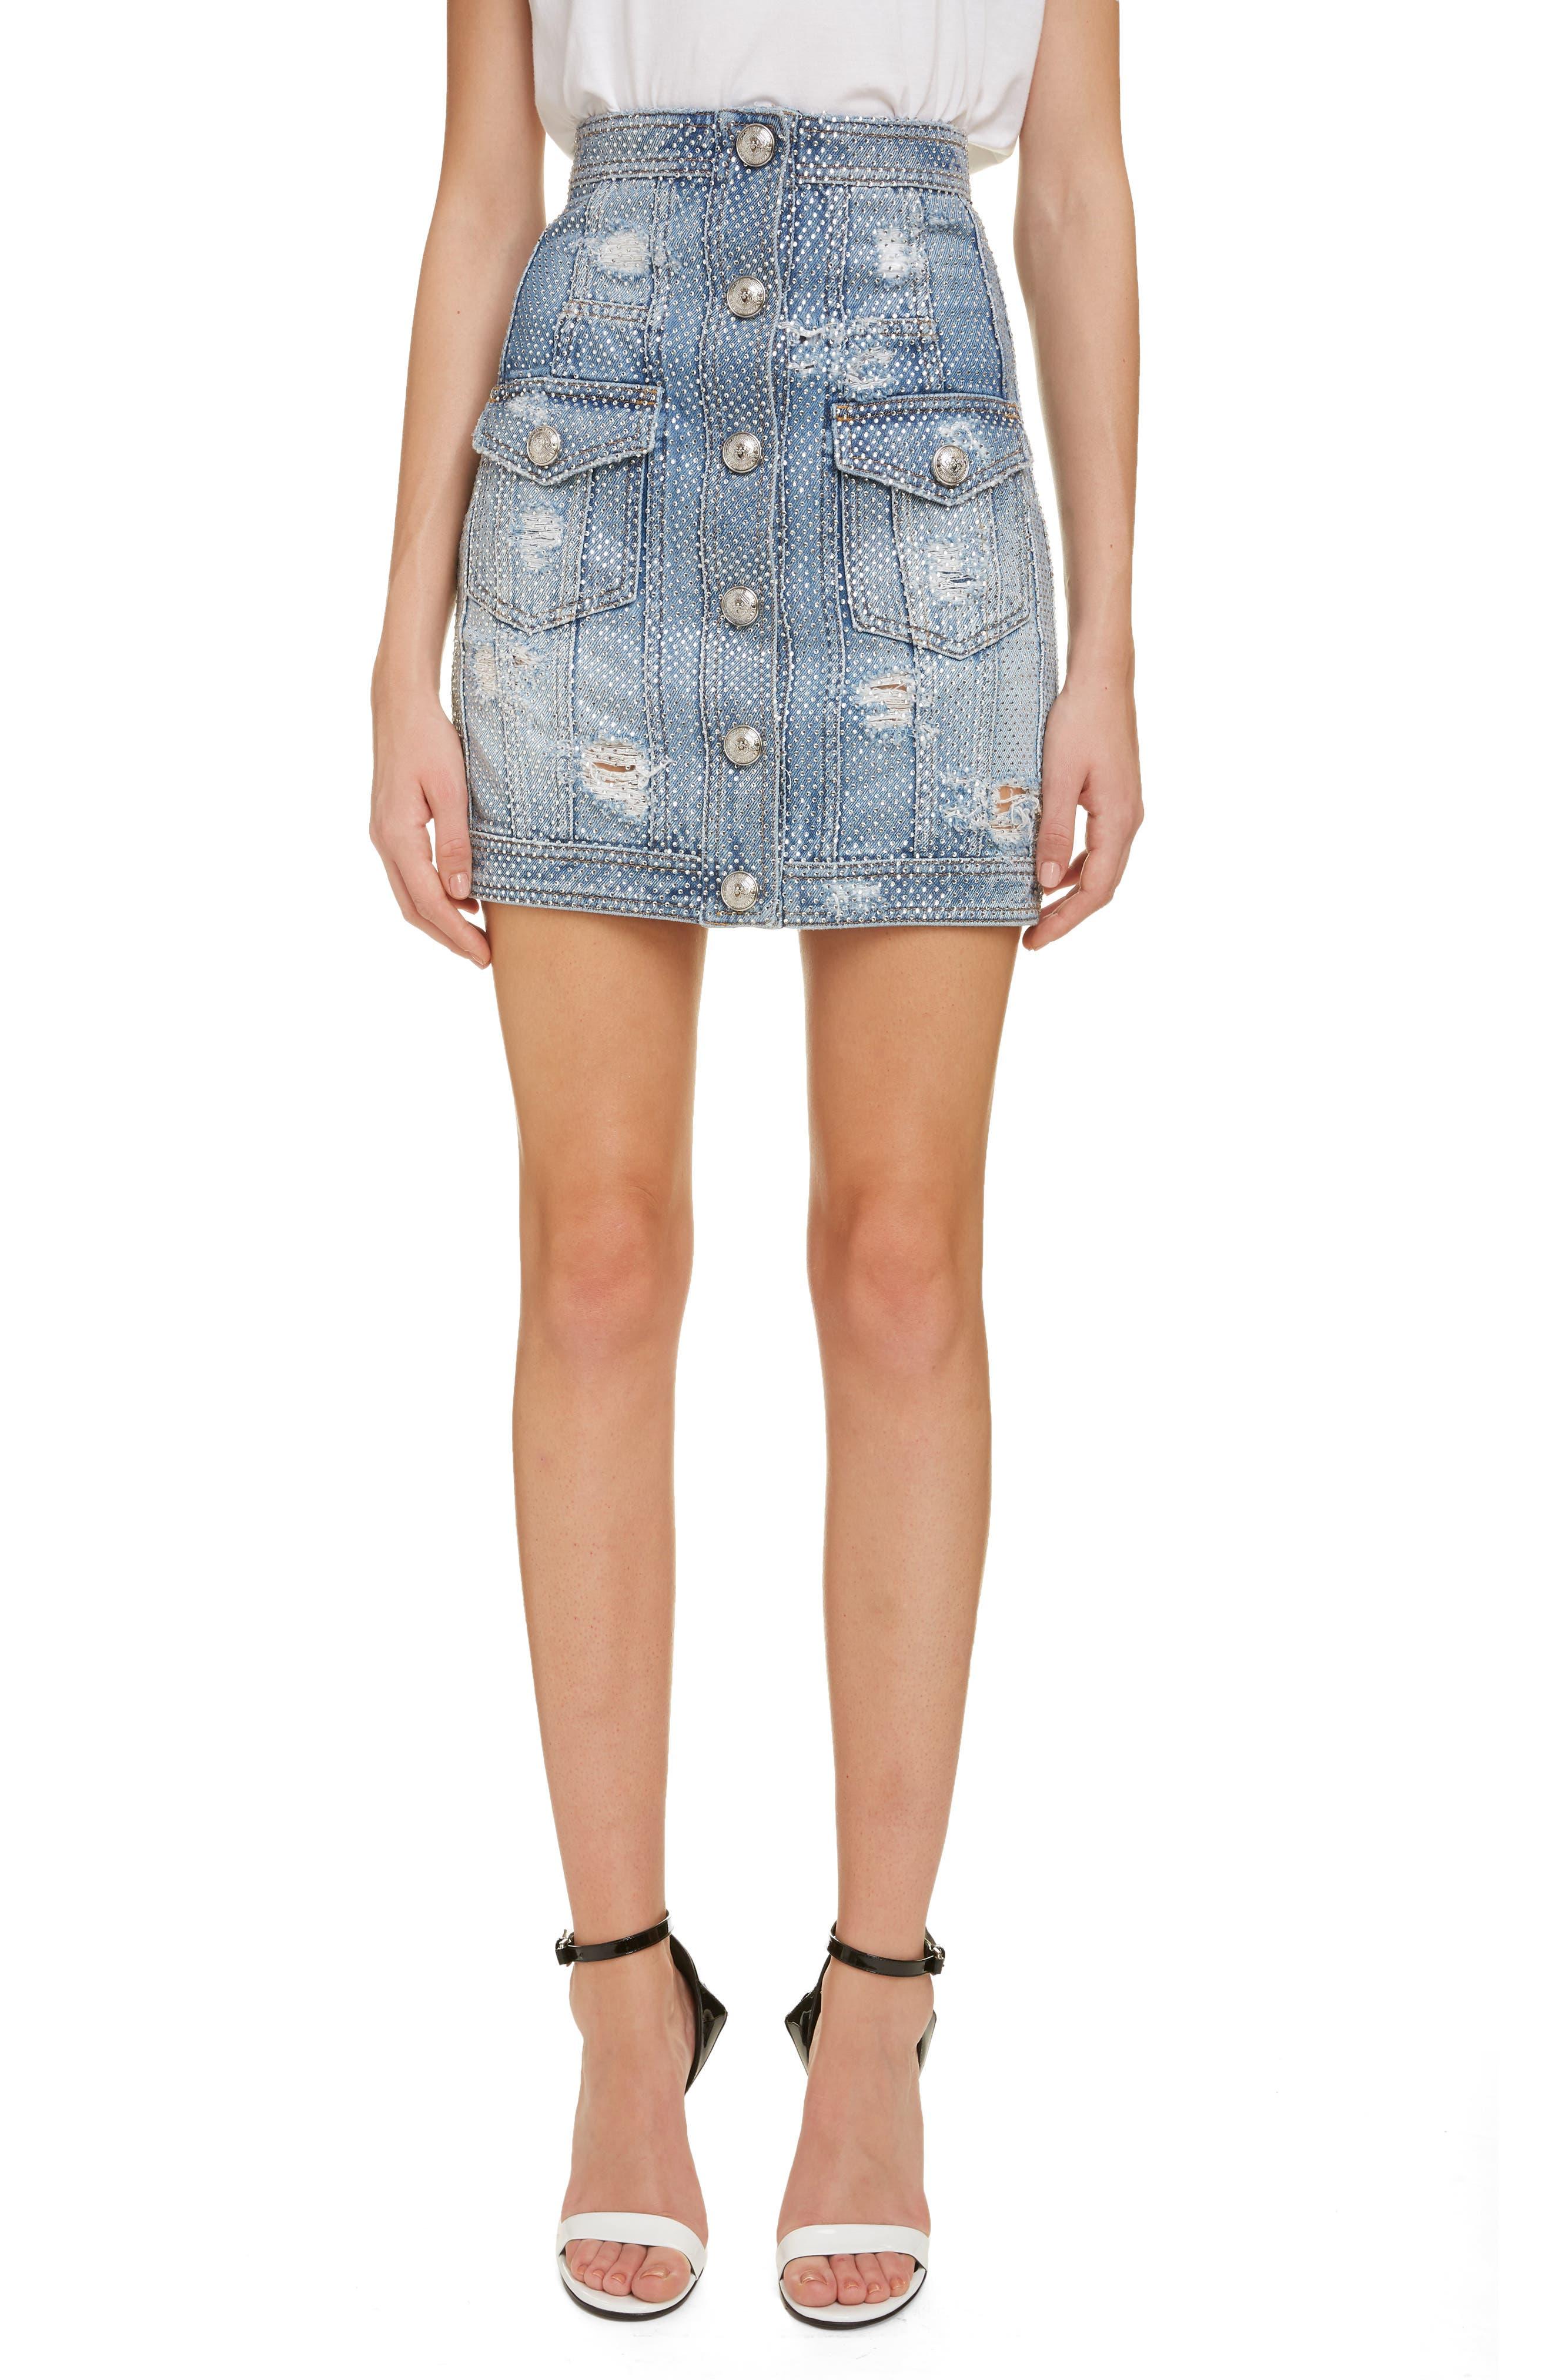 Crystal Studded Denim Skirt, Main, color, SAD BLEU/ ARGENT